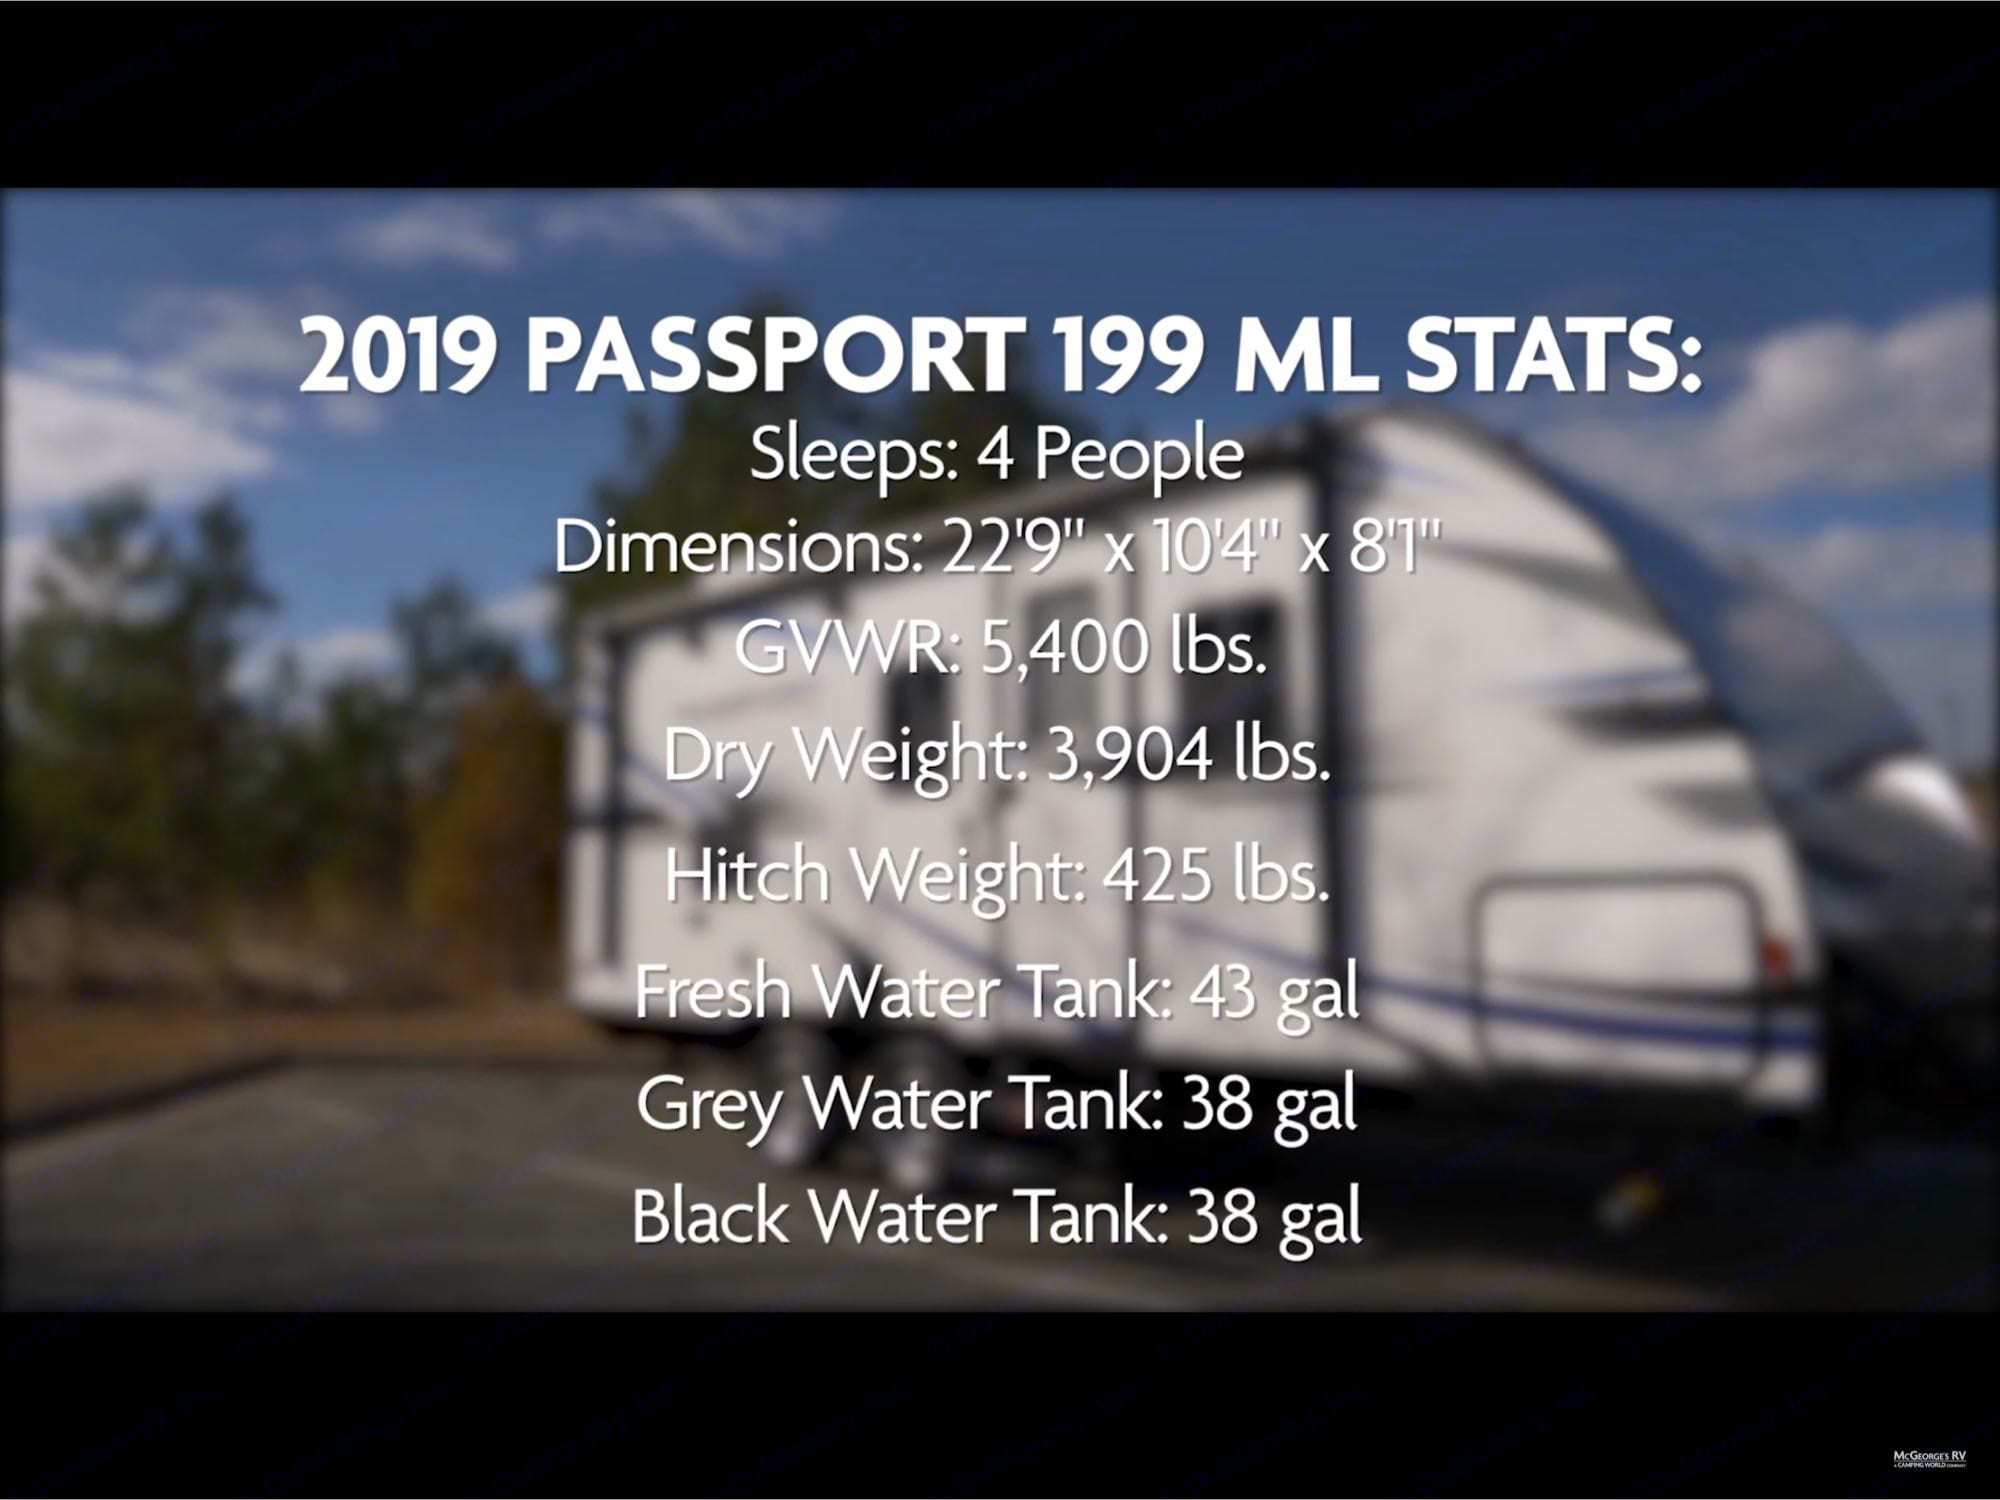 Keystone Passport 2019